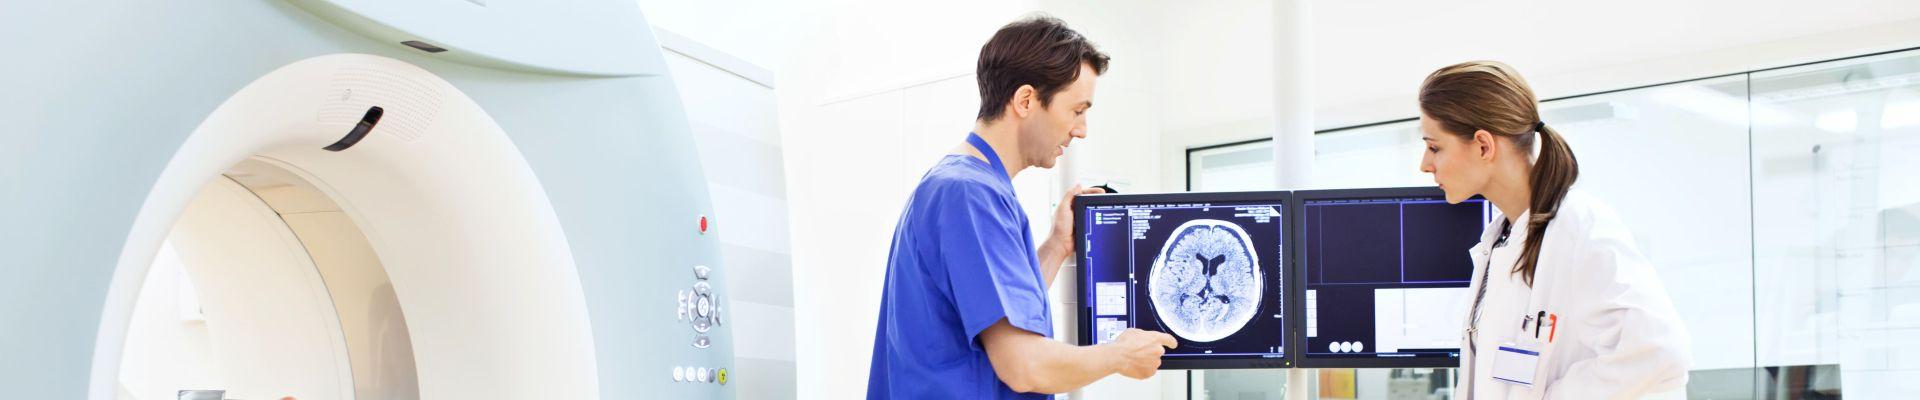 Appareils médicaux